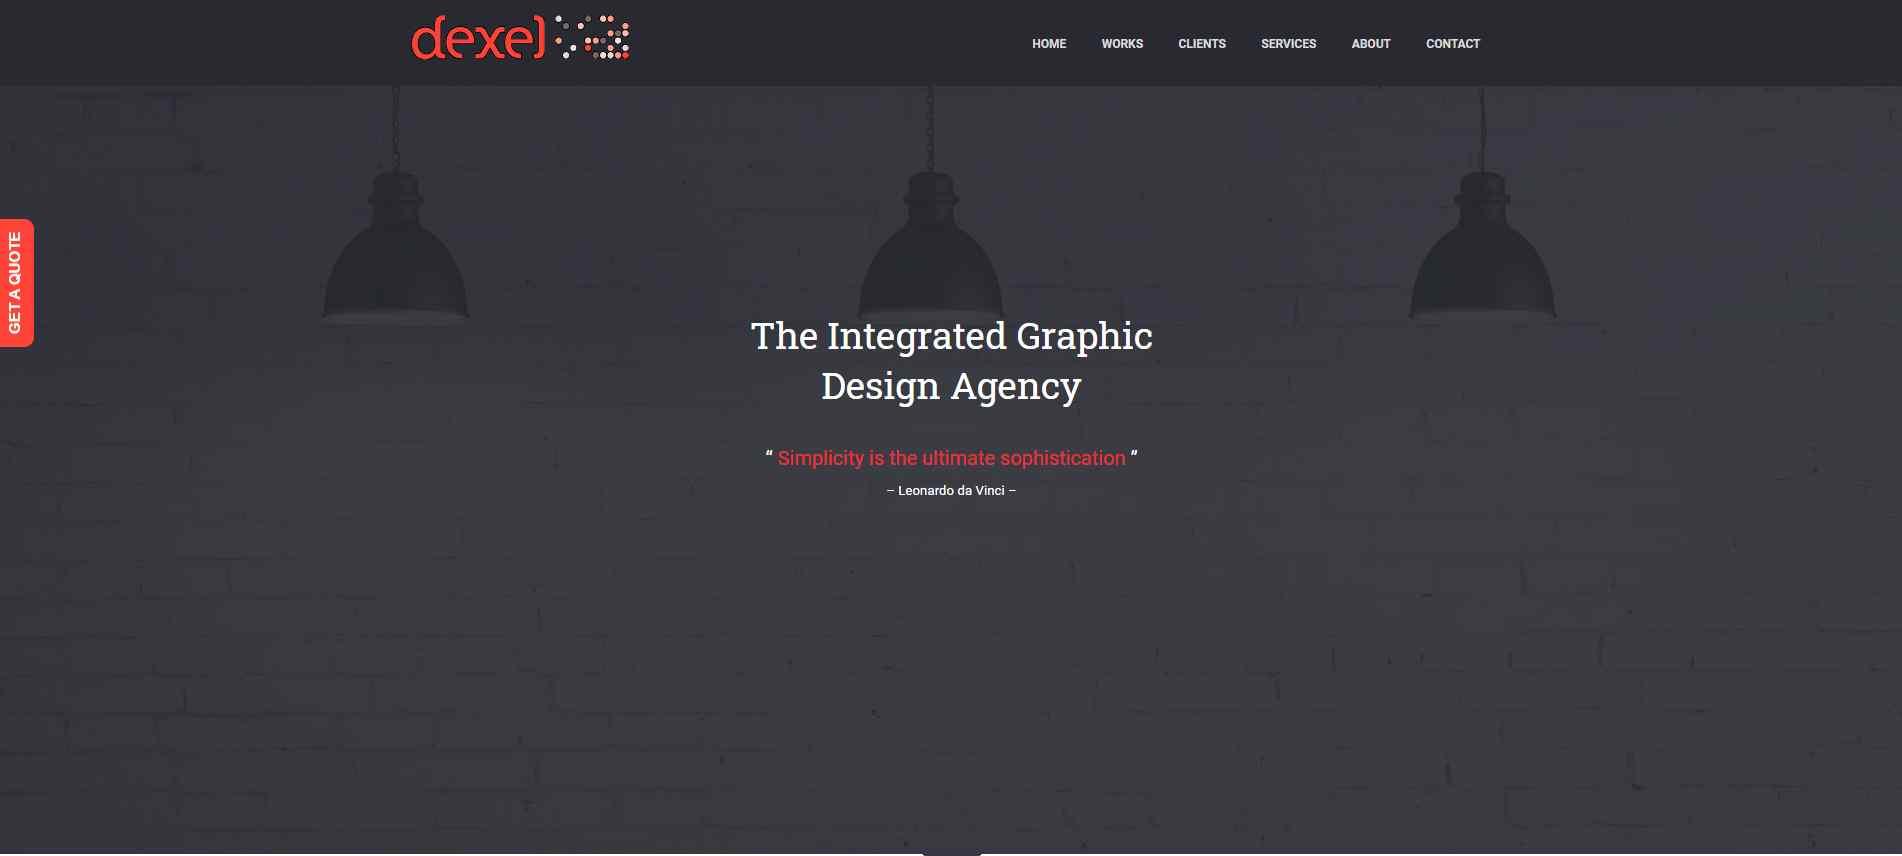 dexel Top Digital Design Agencies in Singapore